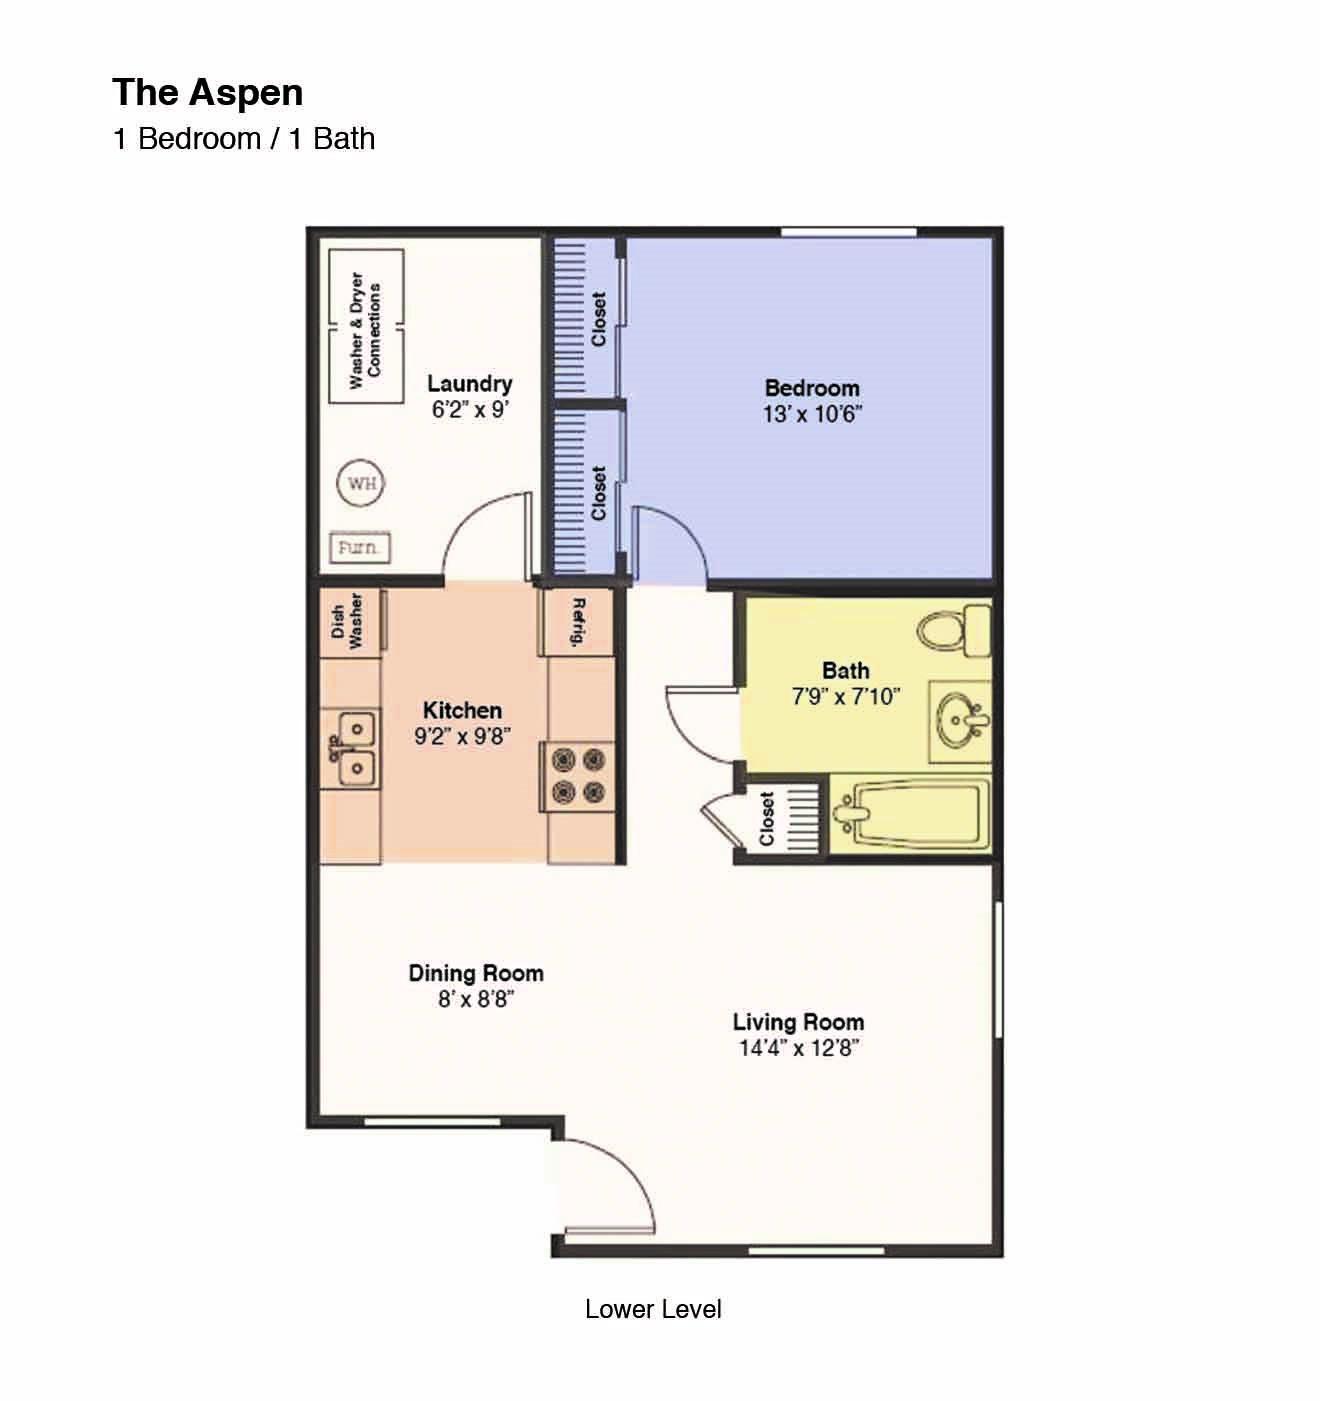 The Aspen Floorplan (1 Bed, 1 Bath)